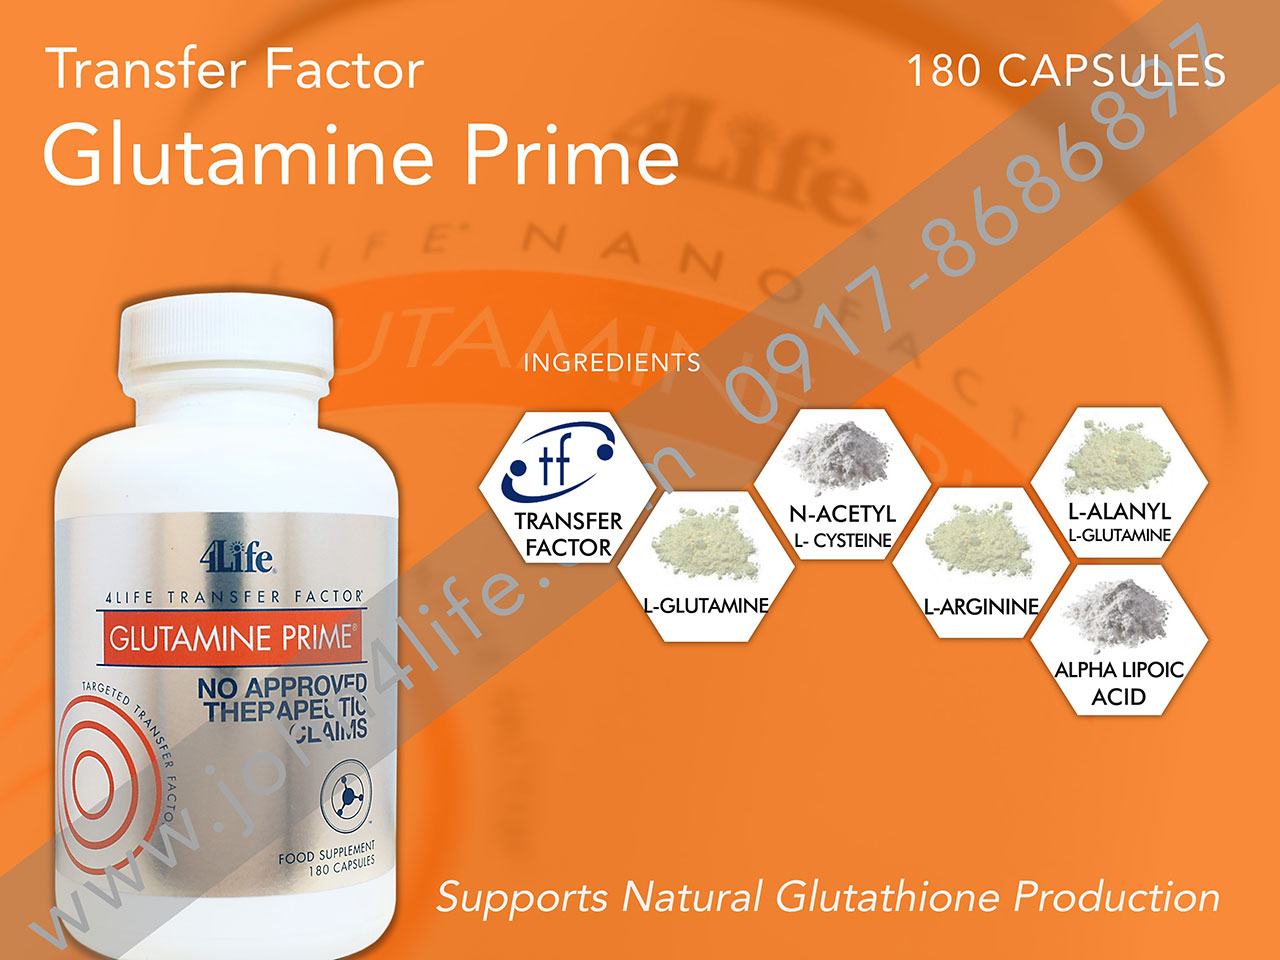 4life glutathione, amino acid, antioxidant